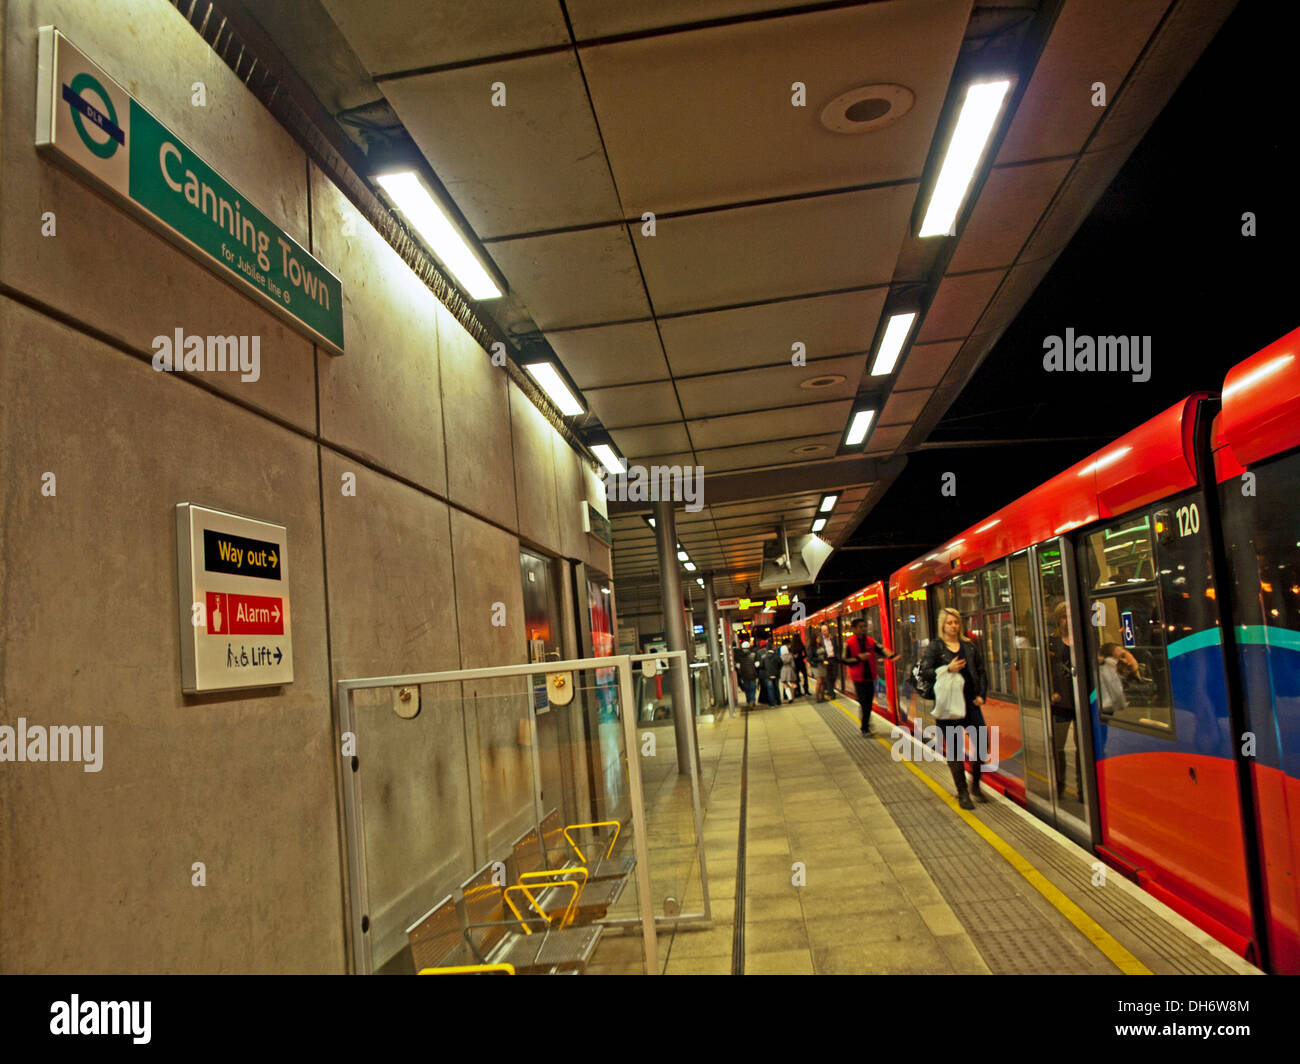 canning-town-dlr-station-at-night-london-england-united-kingdom-DH6W8M.jpg